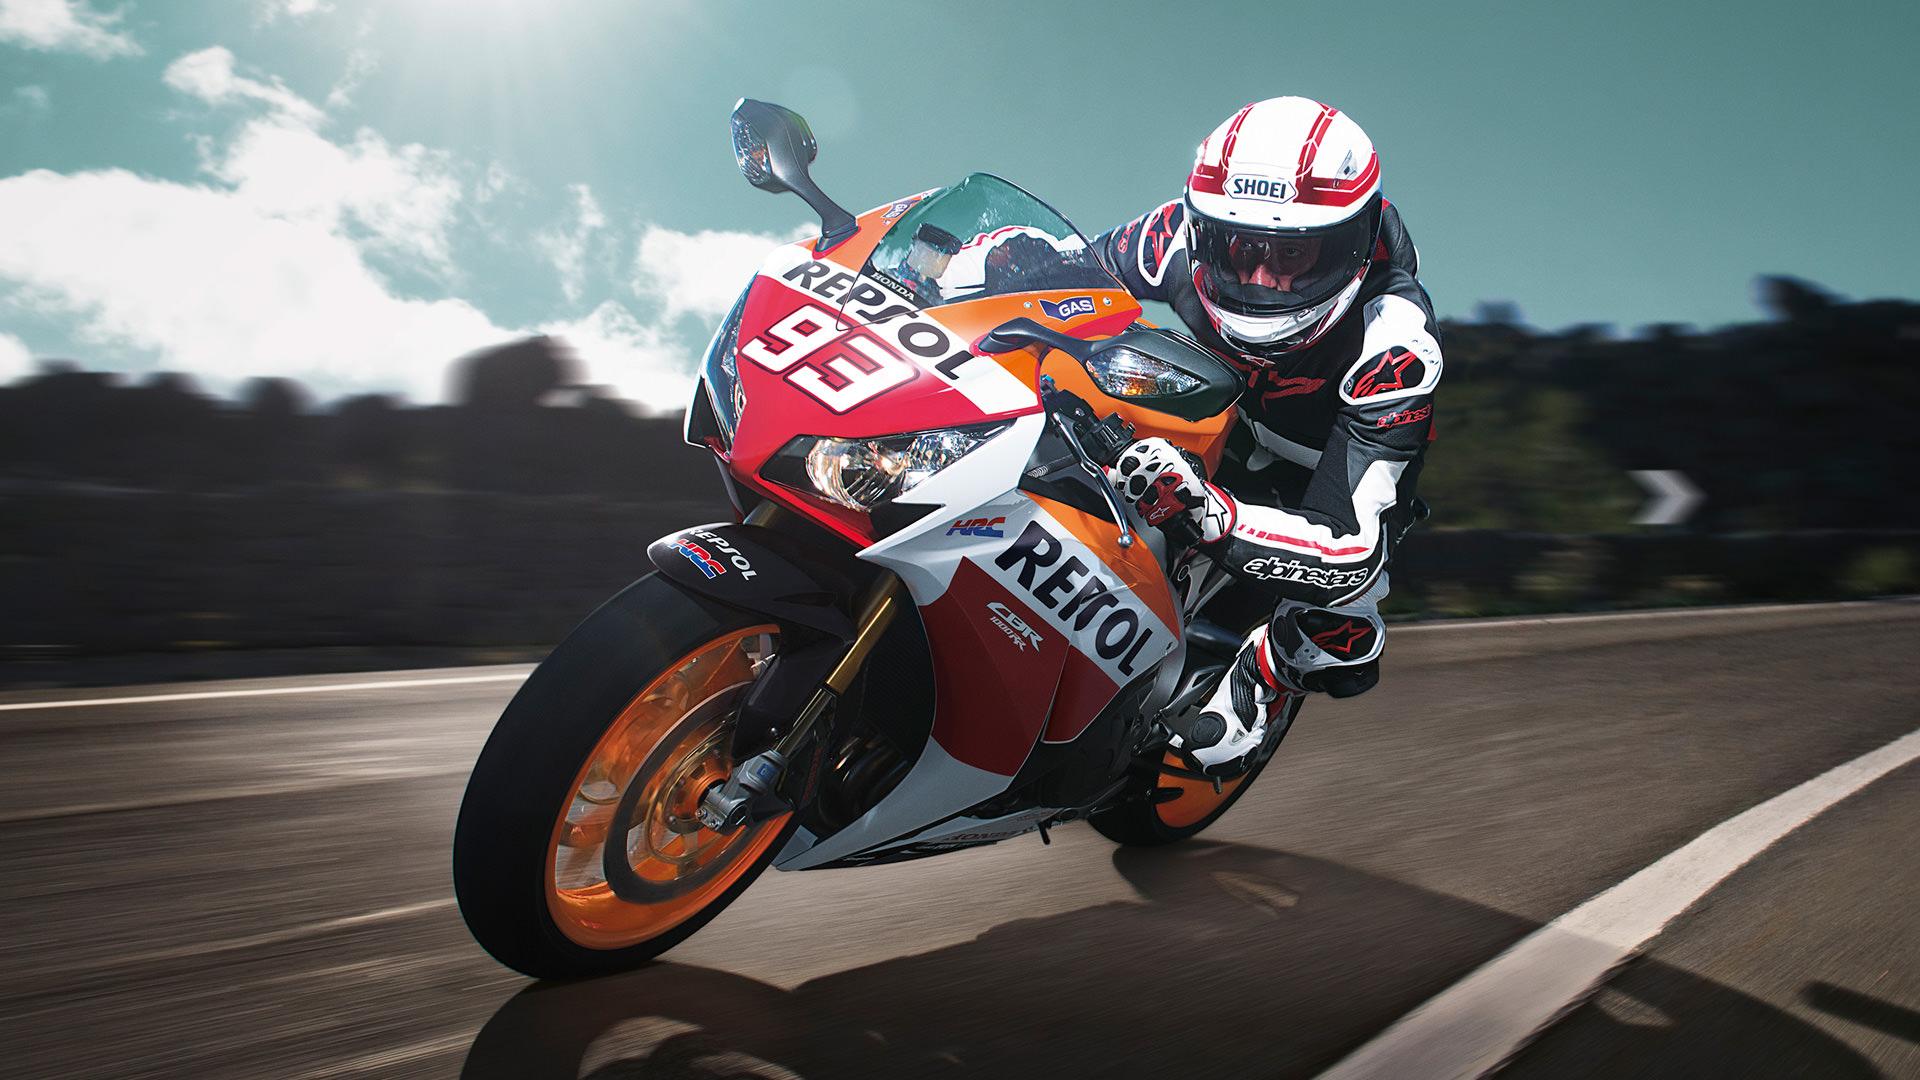 2016 Honda CBR1000RR SP Review / Specs - Sport Bike / Motorcycle